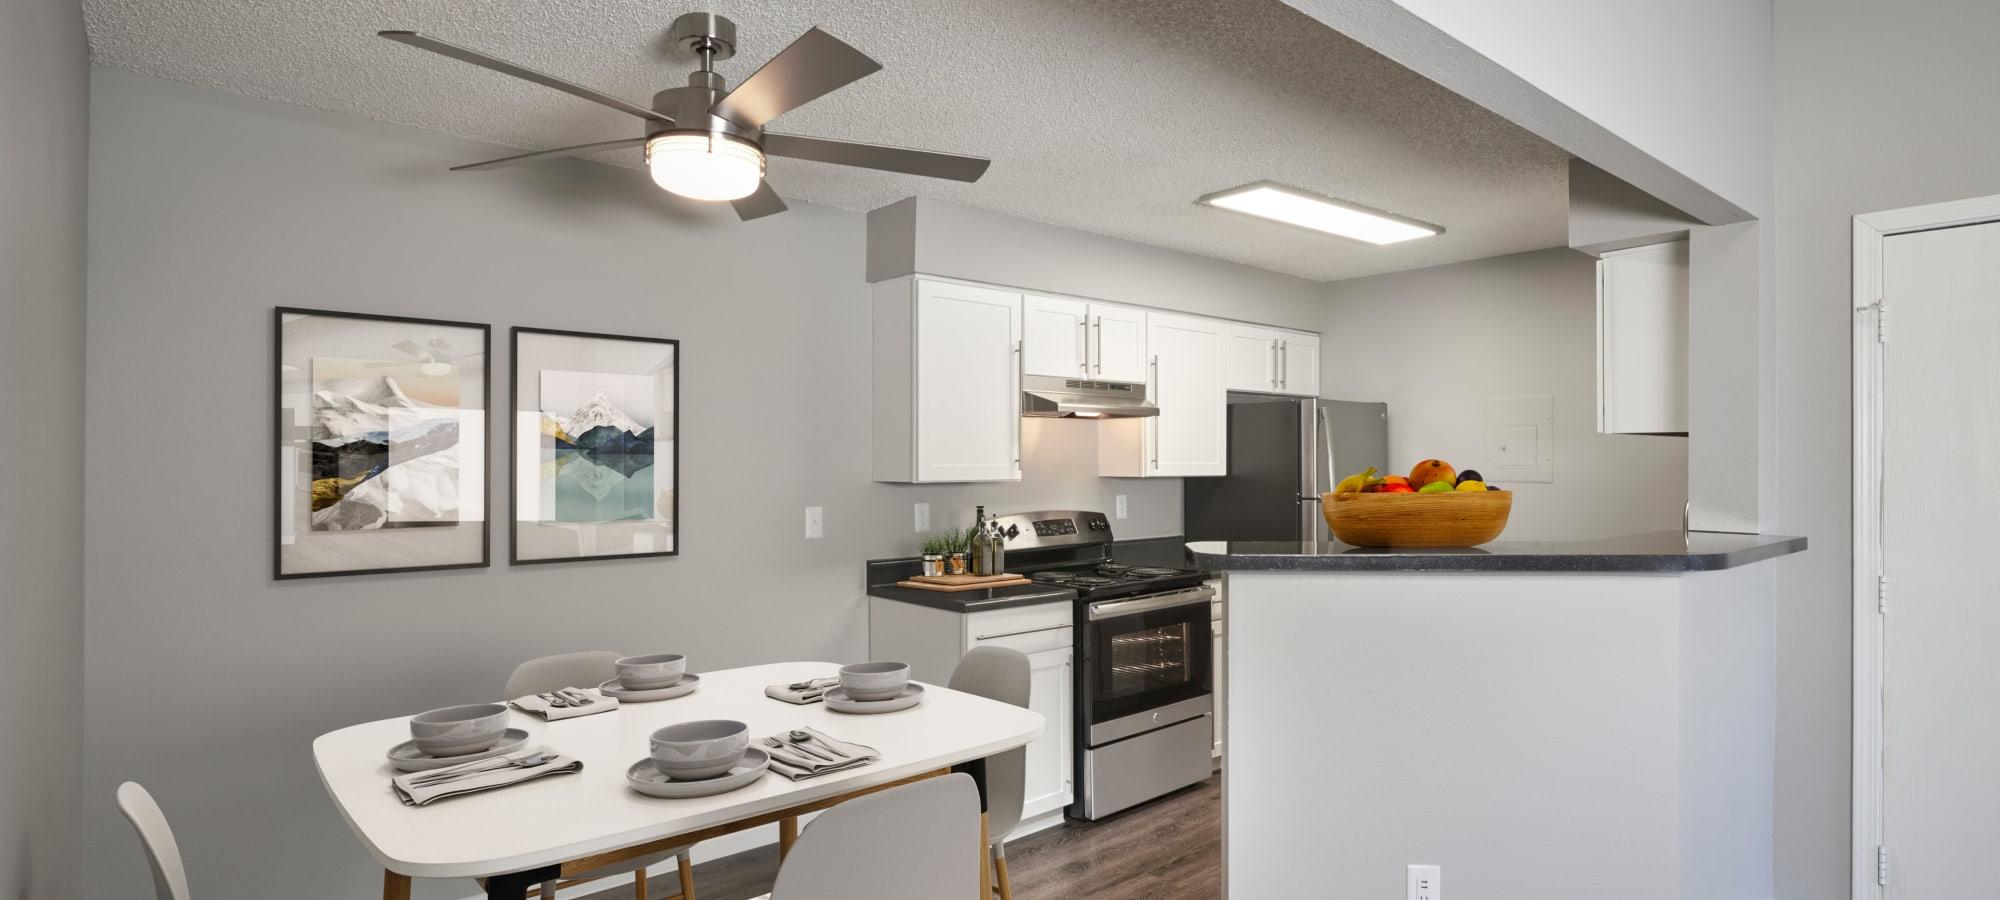 Denver, Colorado apartments at Alton Green Apartments